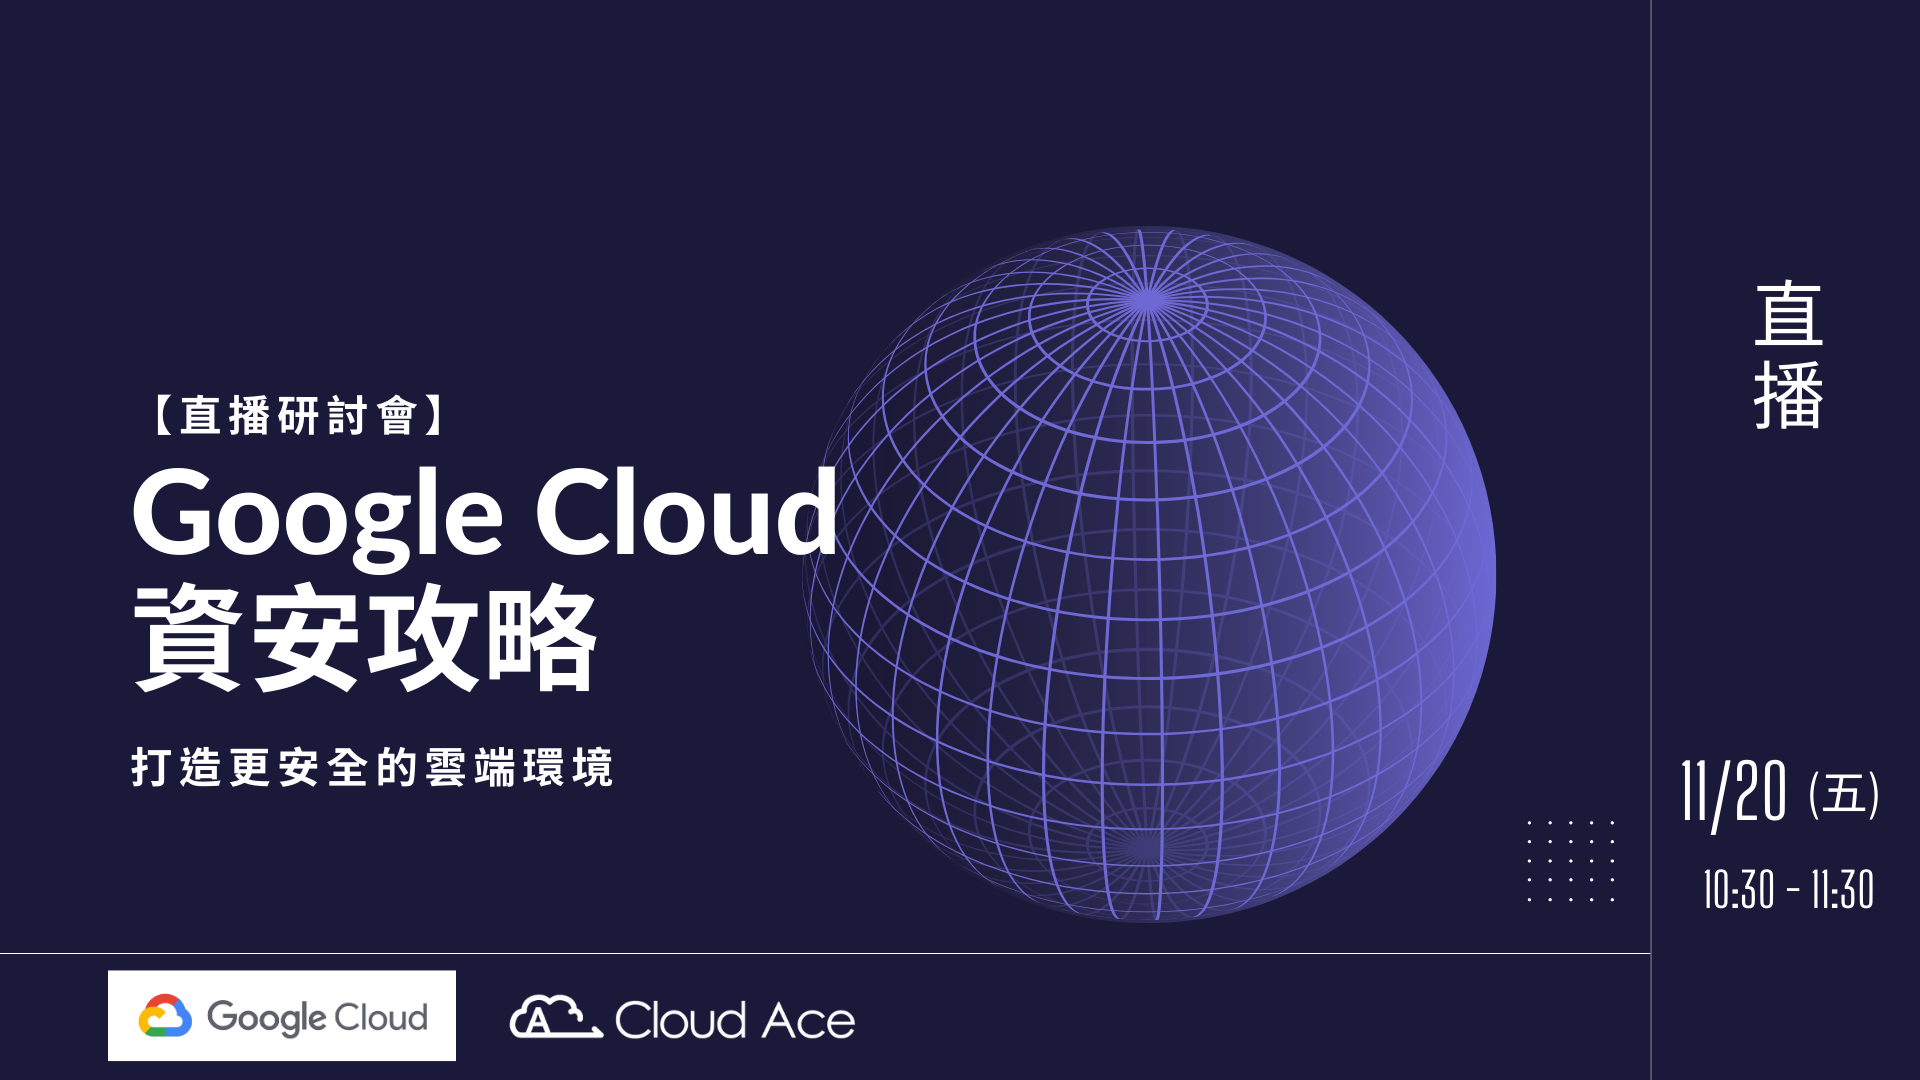 Google Cloud 資安攻略,打造更安全的雲端環境|Google Cloud Security Overview